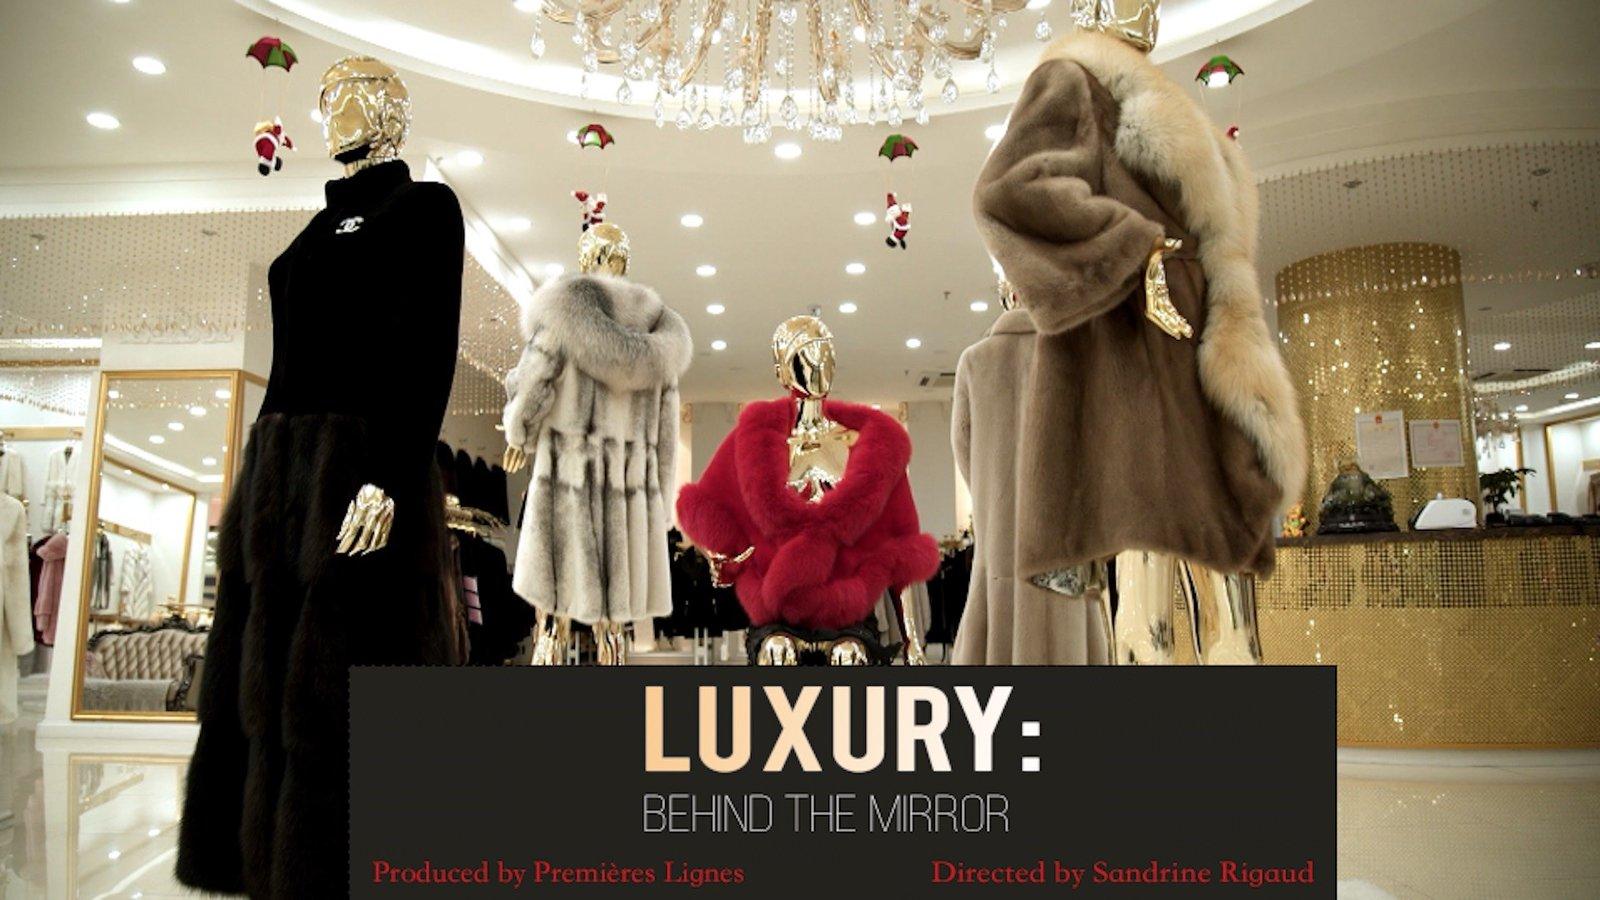 Luxury: Behind the Mirror - The Hidden Price of Luxury